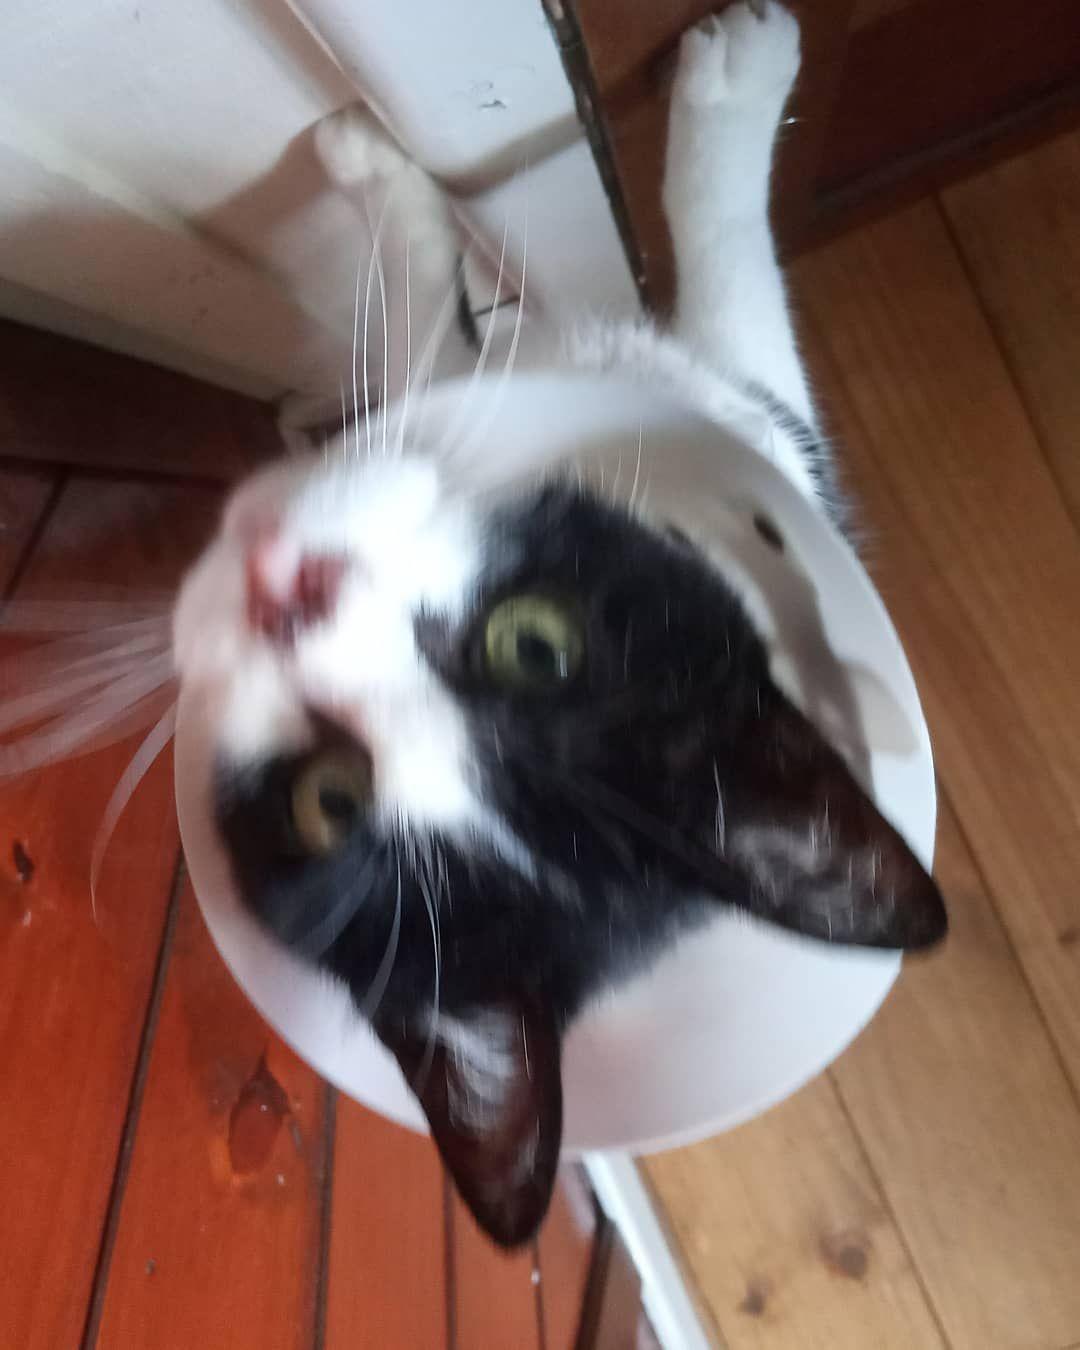 NEW12-Best-cats-cutest2019-Page-2of7  Boa noite!  #Hércules #Gato #CatsOfInstagram #Cutie #CatLover #ILoveMyCat #InstaCat #LoveCats #InstaGato #Catstagram #LoveKittens #InstaKitty #MeuGato #InstagramCat #CatPic #Adorable #Kitties #VidaDeGato #GatosDoInstagram #GatoFofo #AmoPet #CatPhoto #LovePet #InstaCute #Pet #PicOfTheDay #PhotoDaily